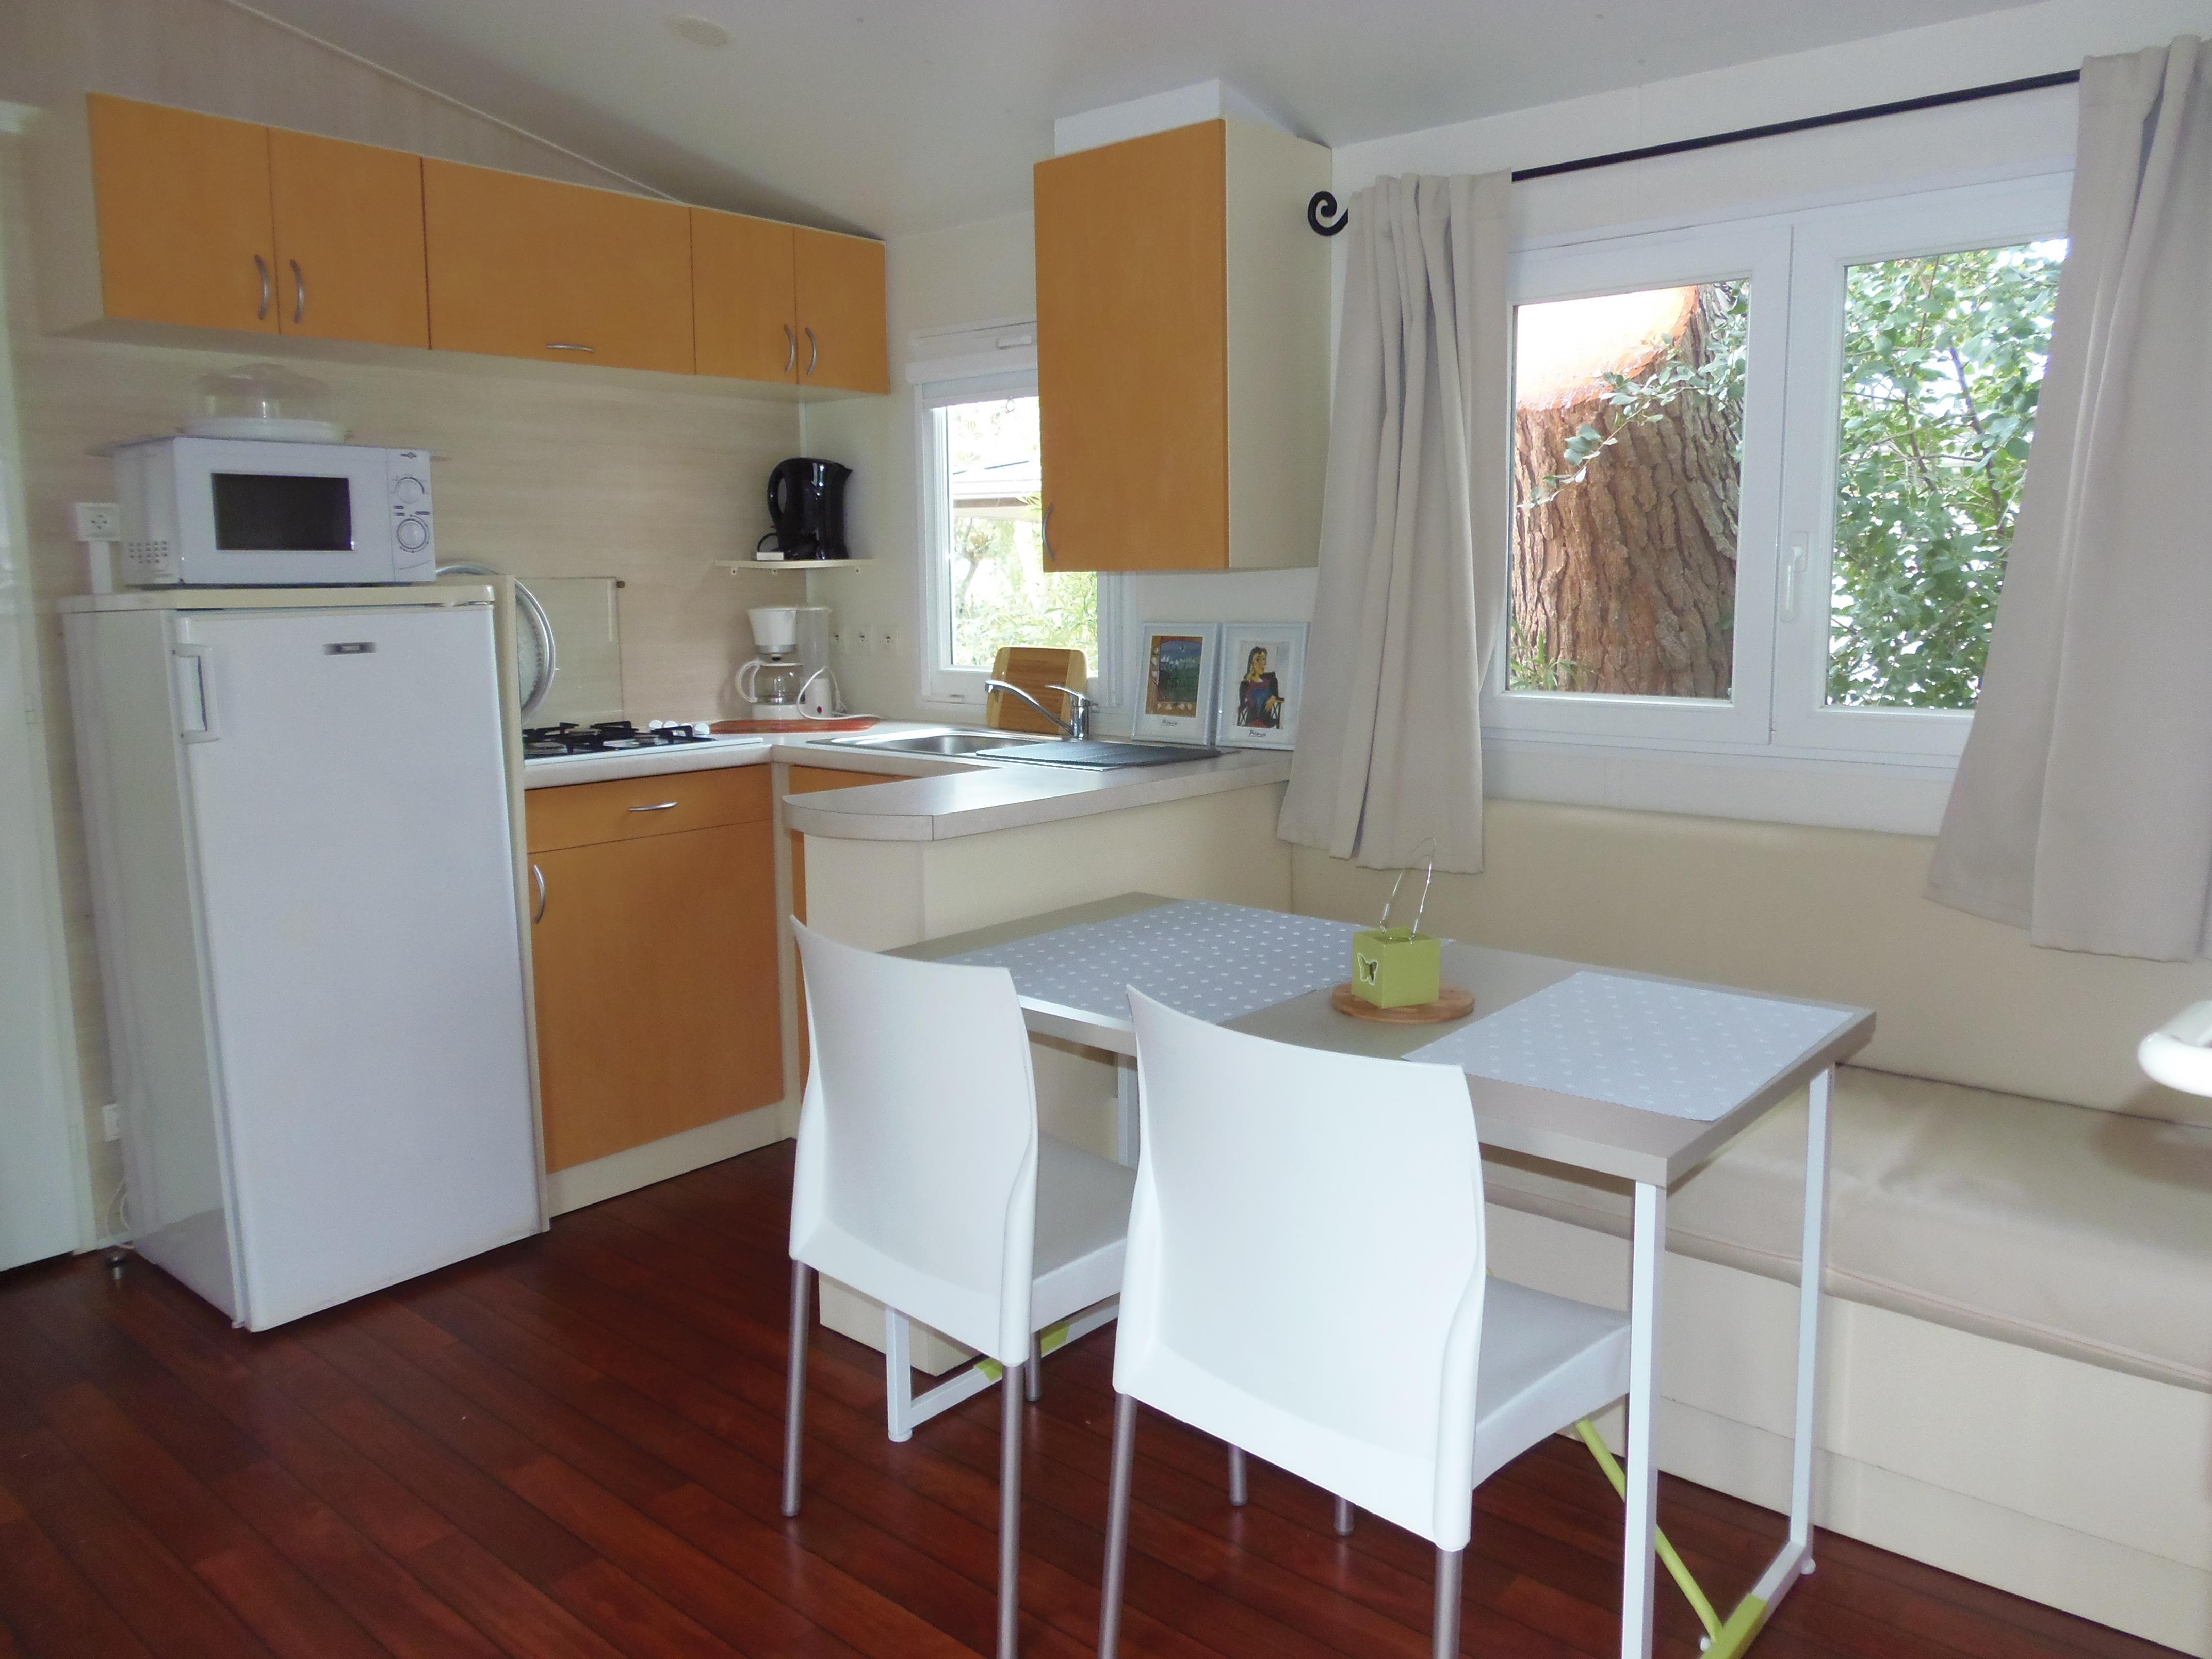 Stacaravan les Lys 30 m² - 2 kamers - terras 10 m²